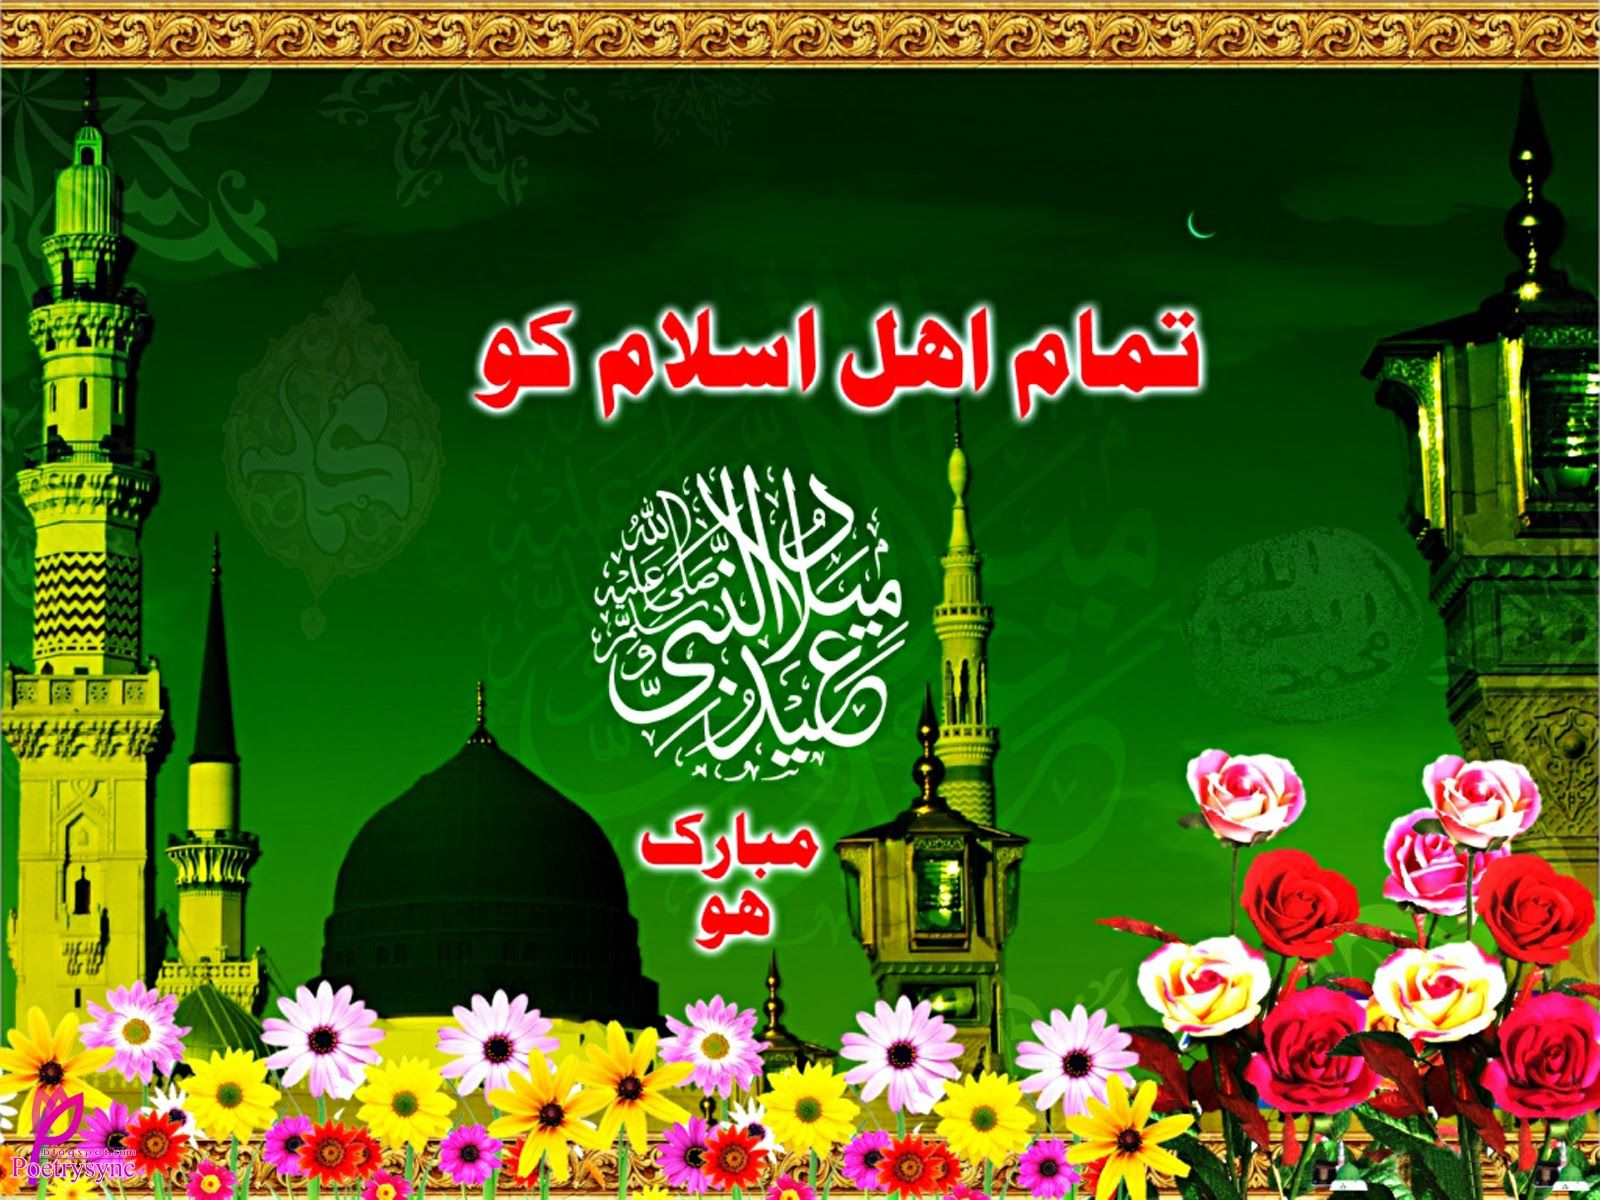 Poetry eid e milad un nabi urdu shayari sms with greetings images poetry eid e milad un nabi urdu shayari sms with greetings kristyandbryce Images